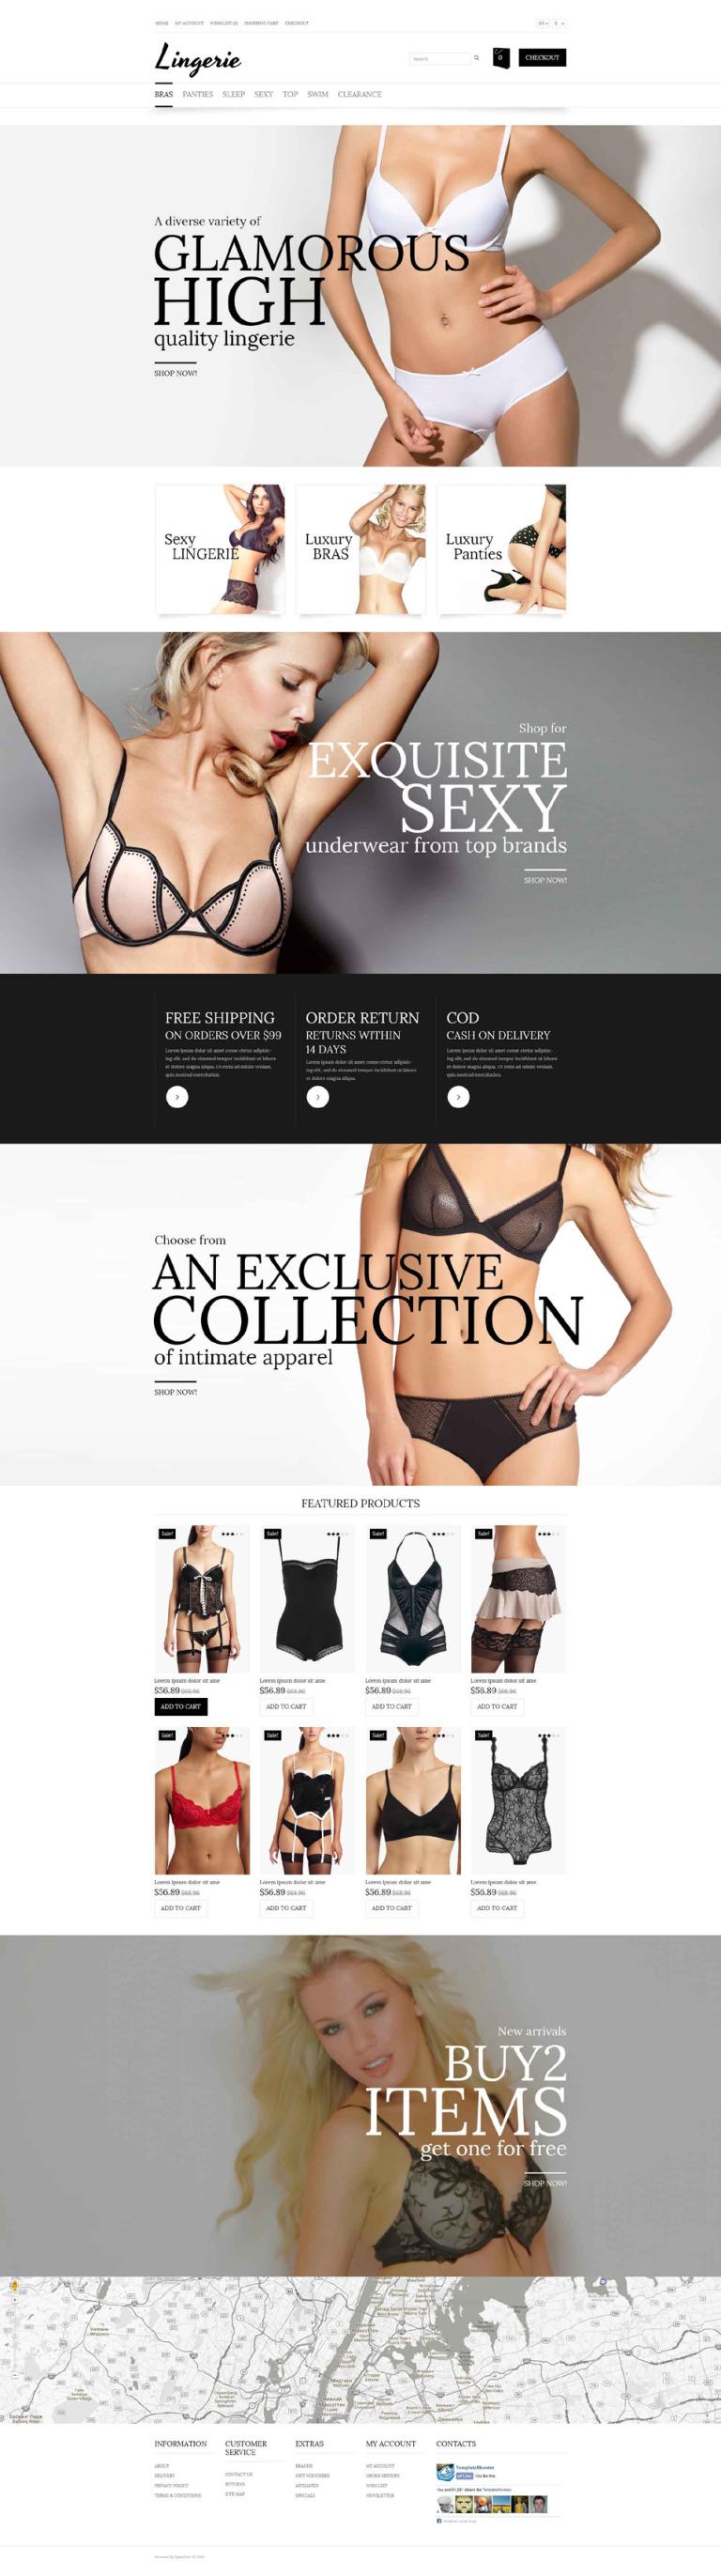 Lingerie Store OpenCart Template New Screenshots BIG